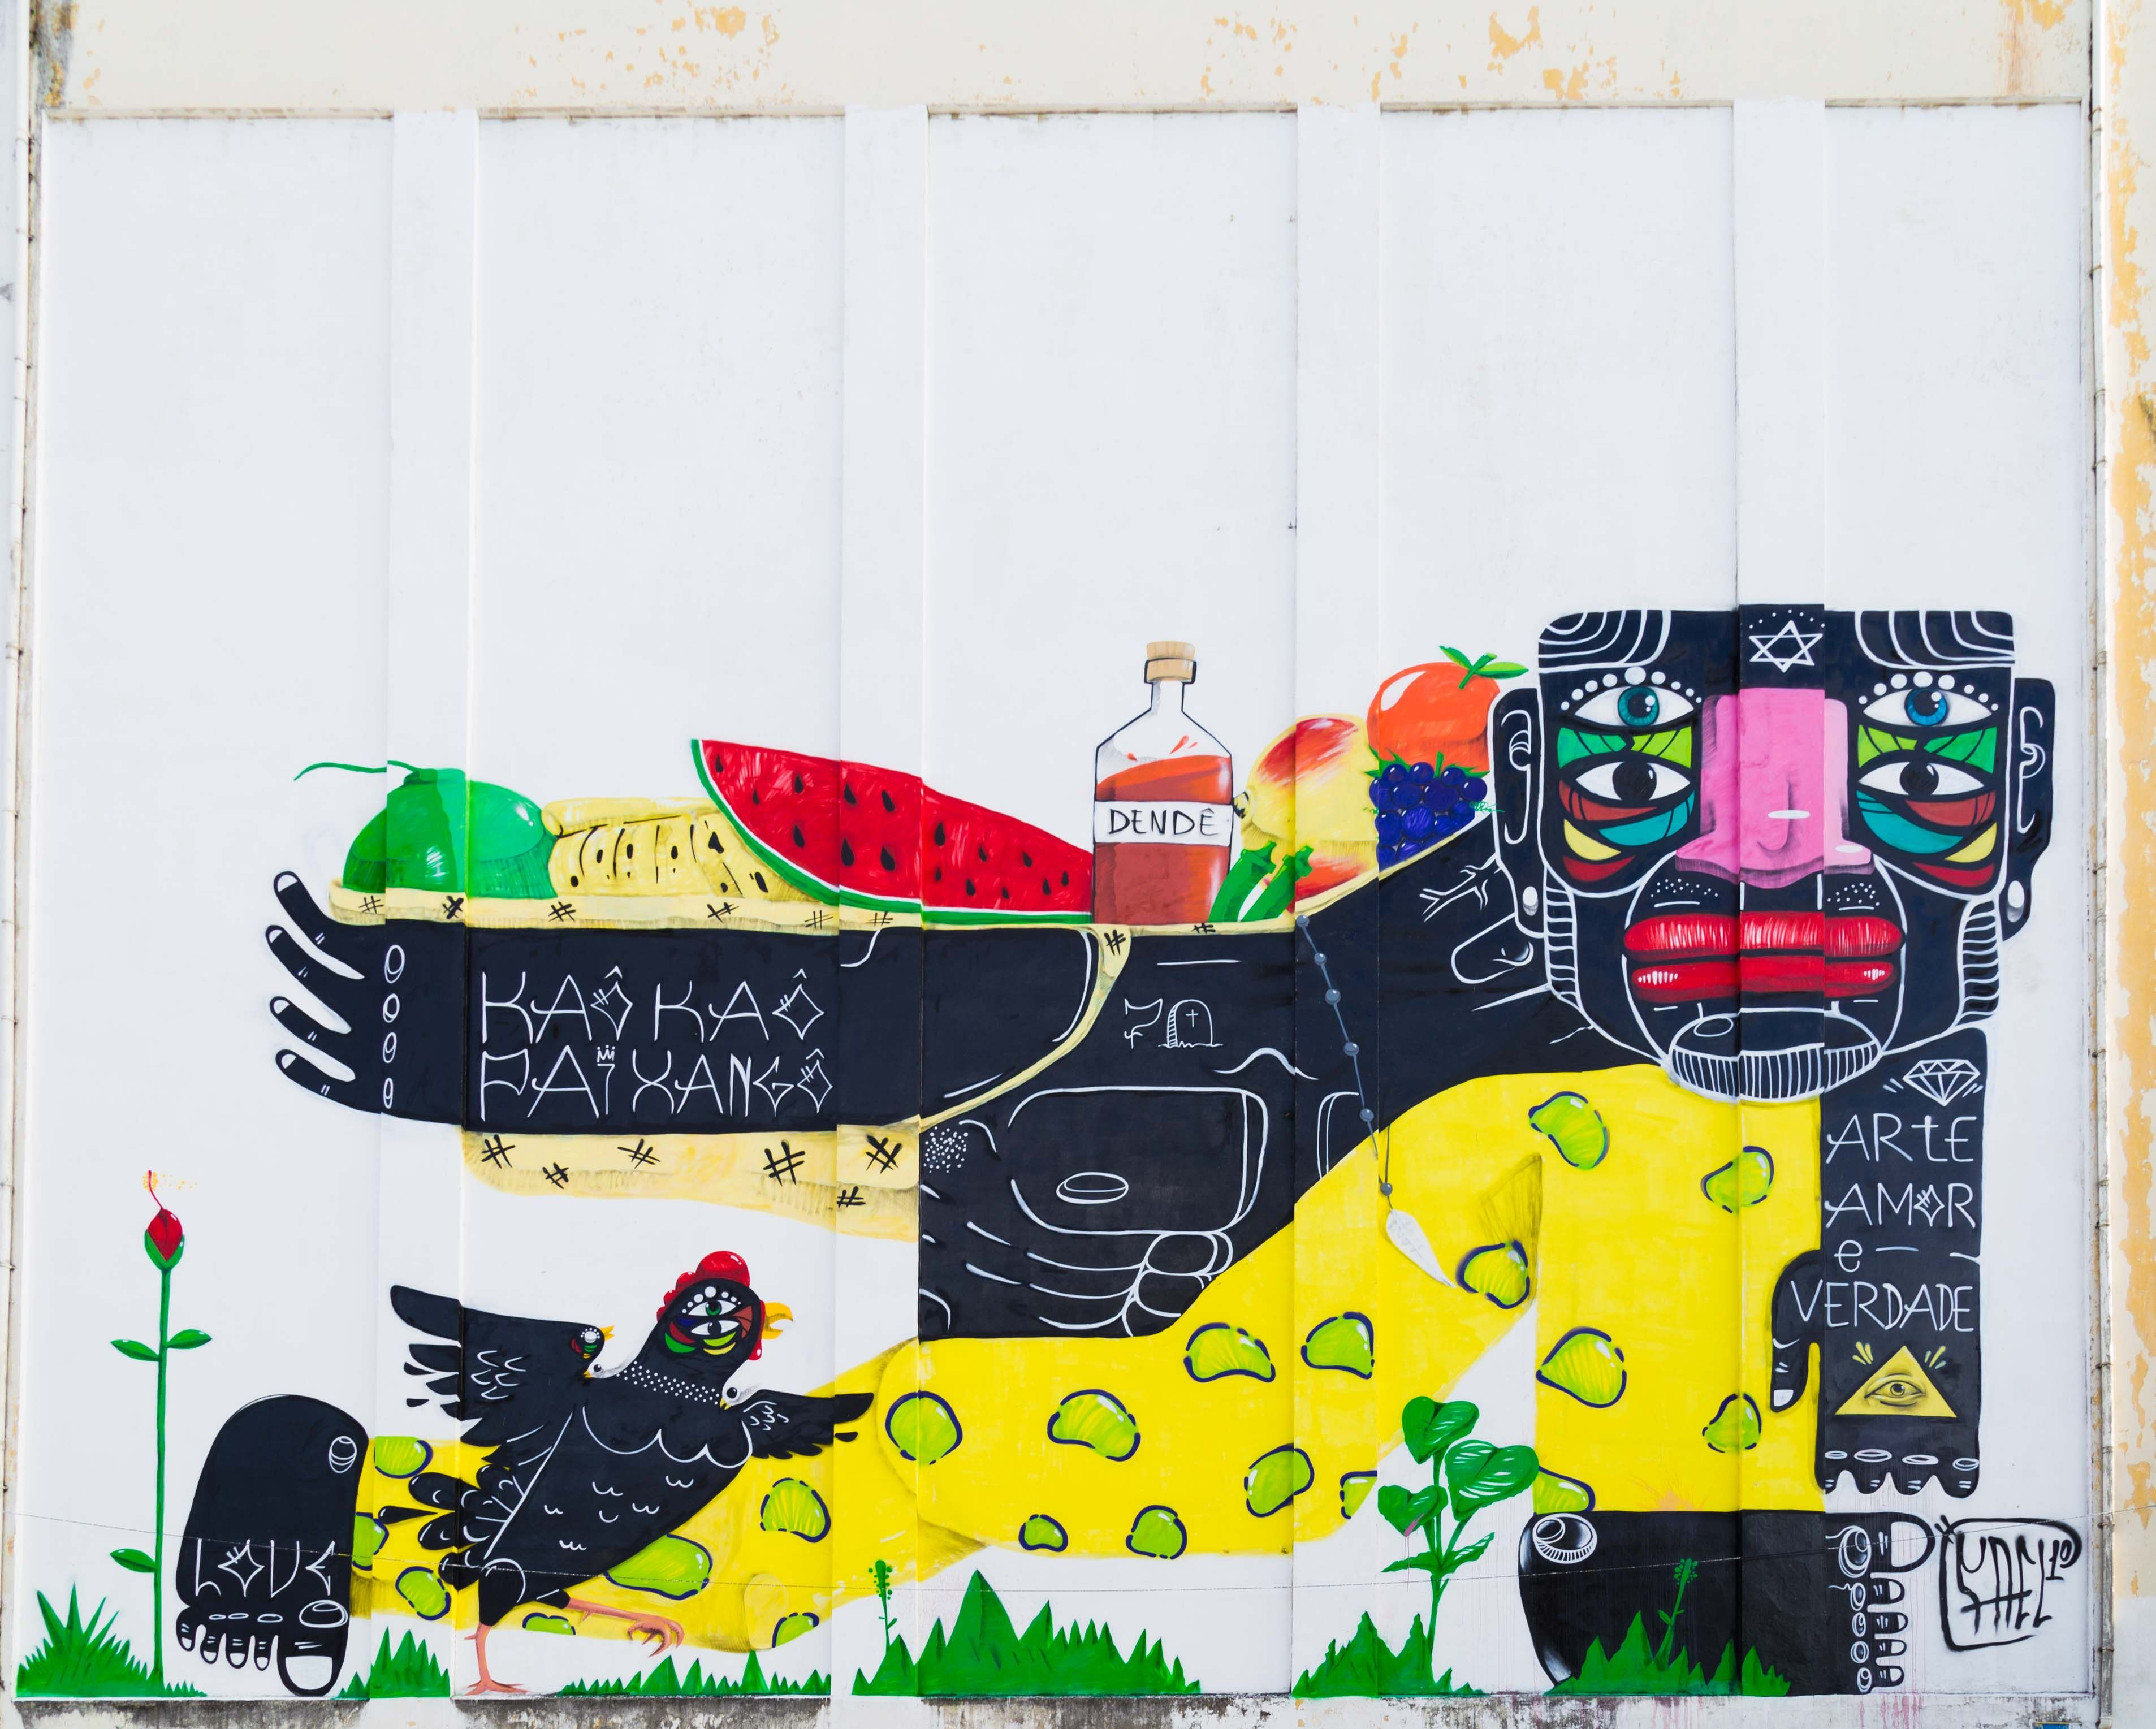 #graffiti #iluminarte #streetart #faelprimeiro